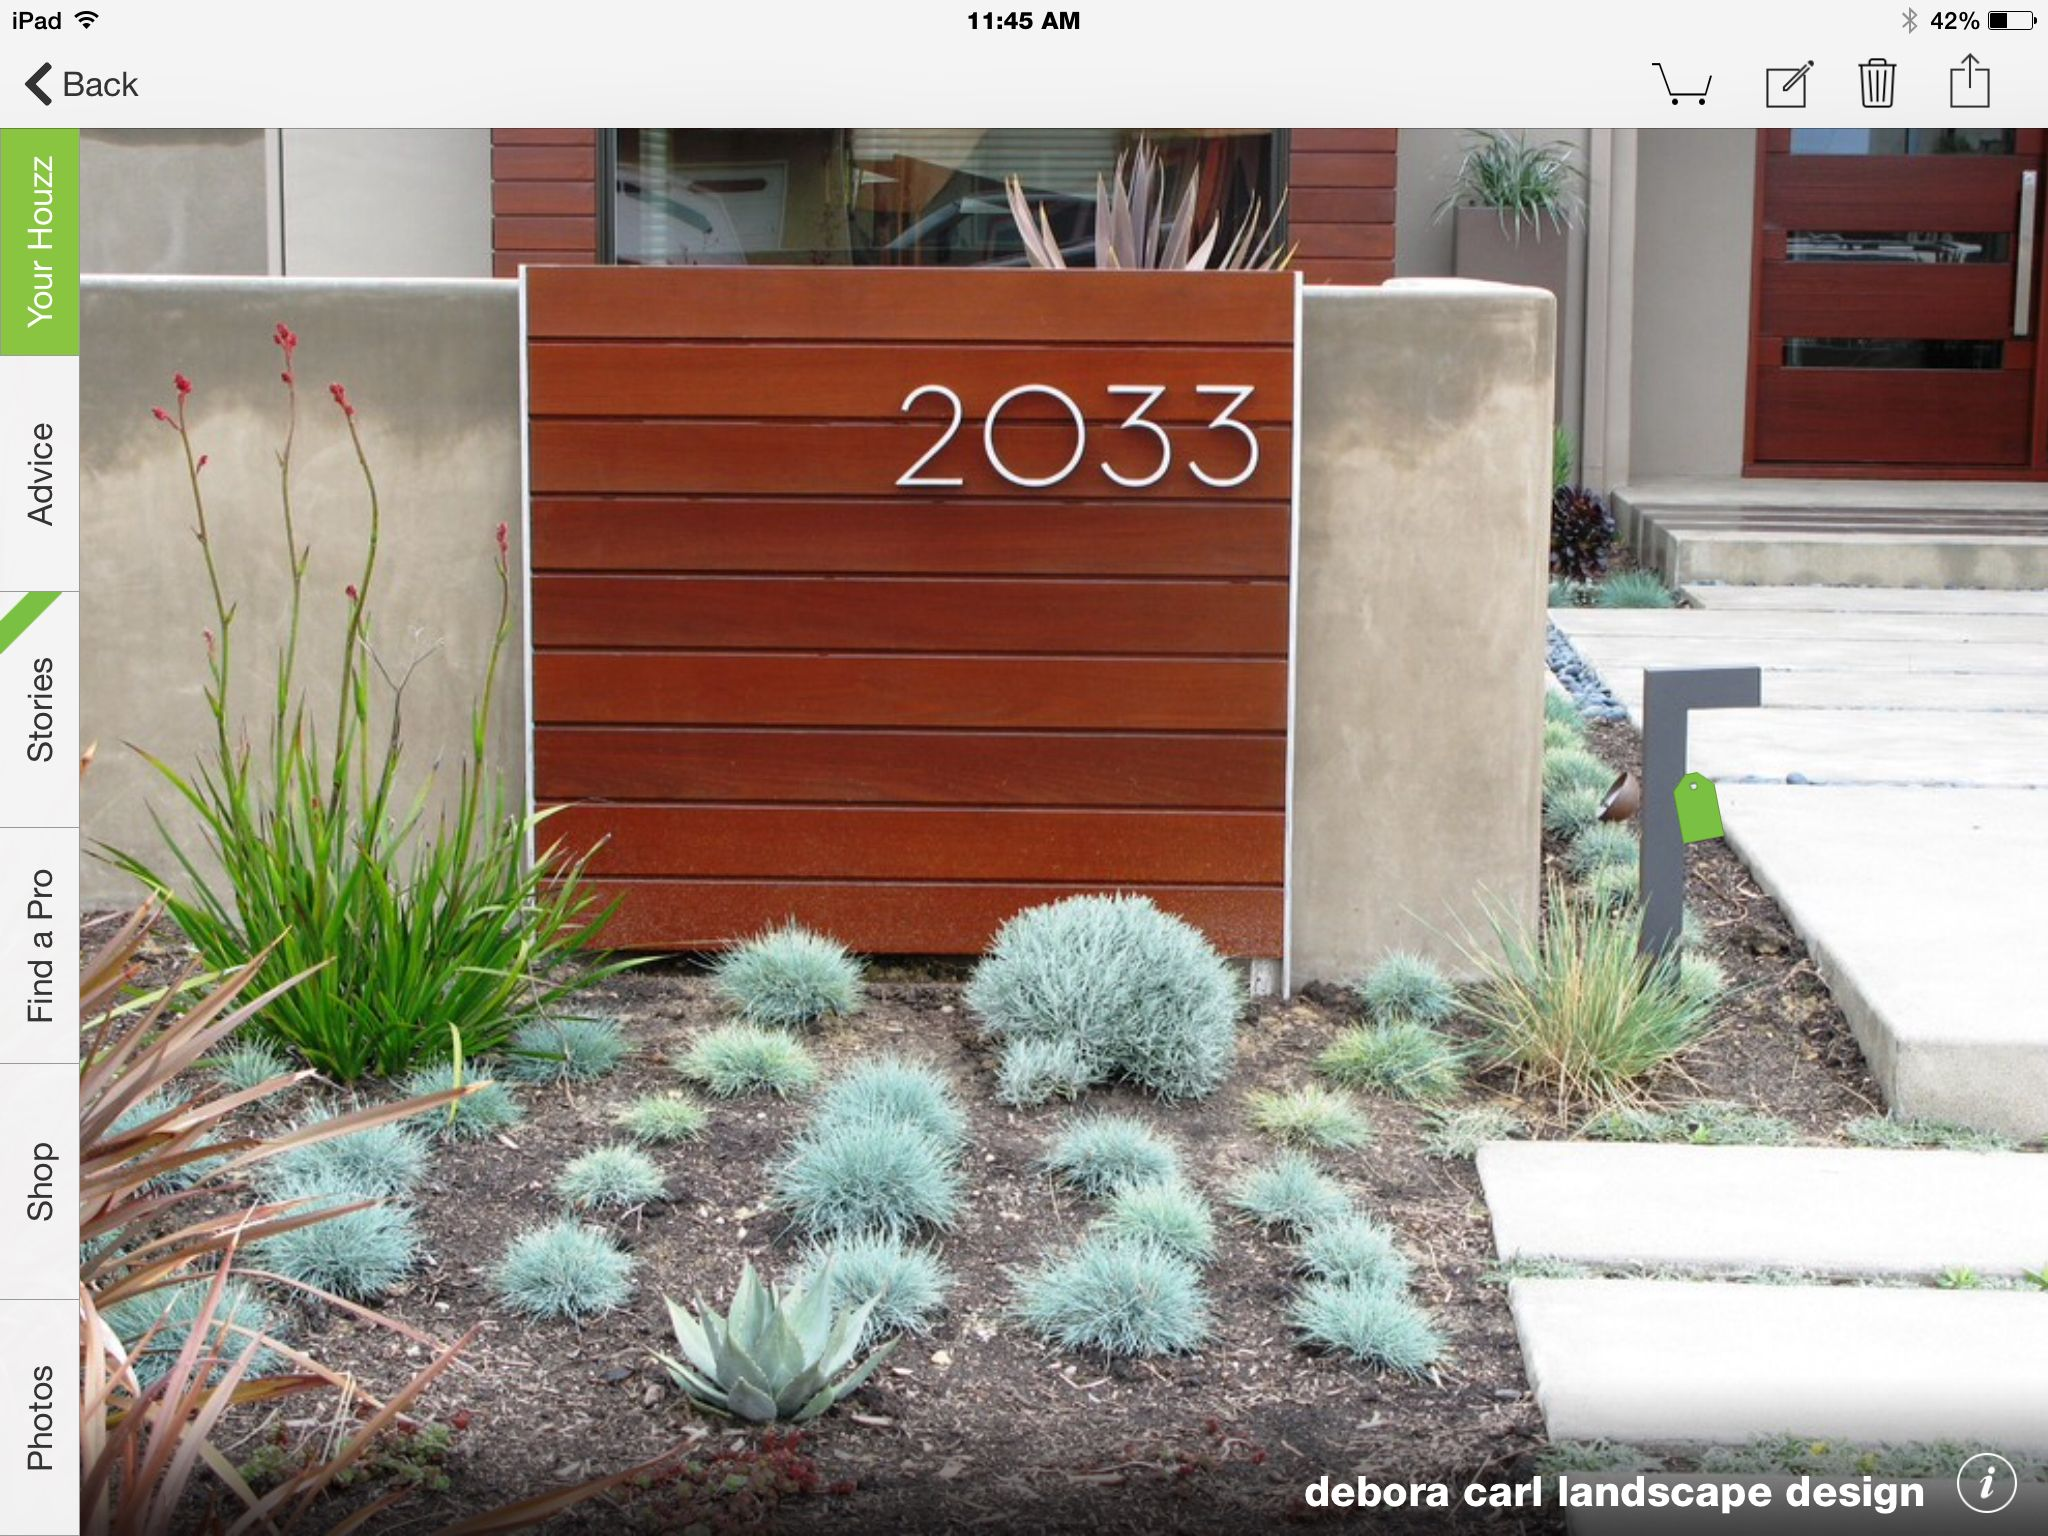 Drought Tolerant Landscape, Succulents, Mediterranean Garden, Houzz.com